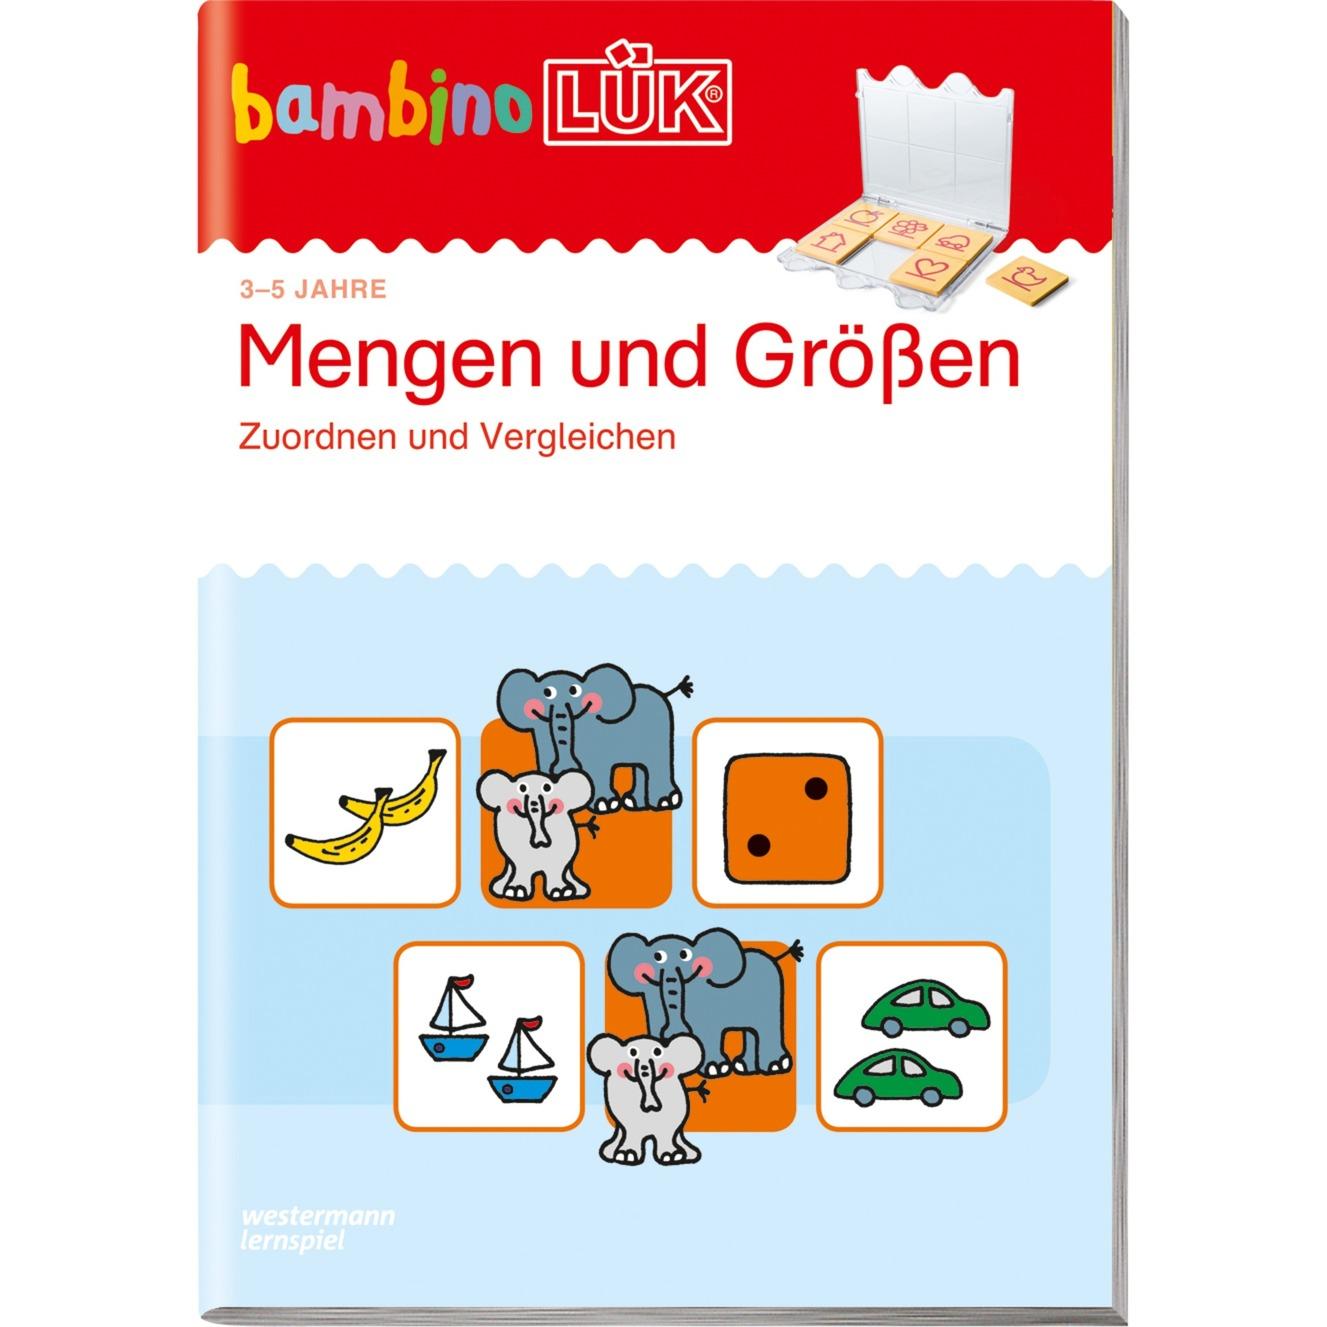 bambinoLÜK Mengen, Größen vergleichen livre pour enfants, Manuel